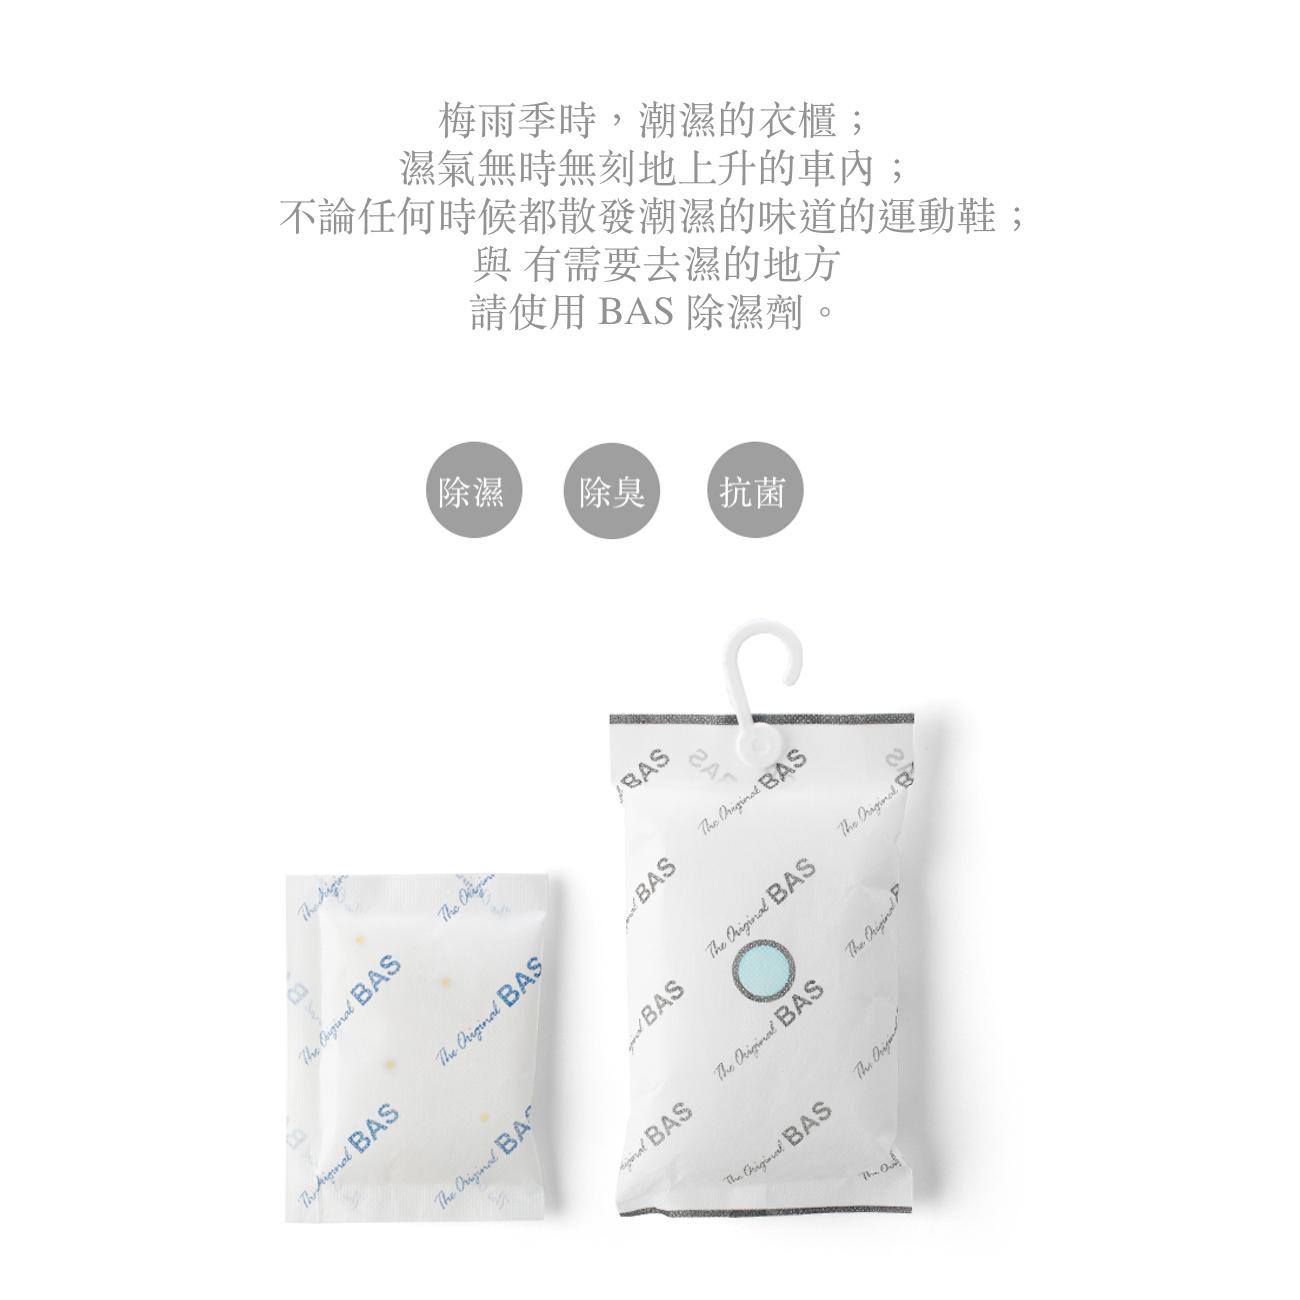 [shiPAPA] 生活除臭除濕劑 2 Shapes|韓國直送|香港 澳門